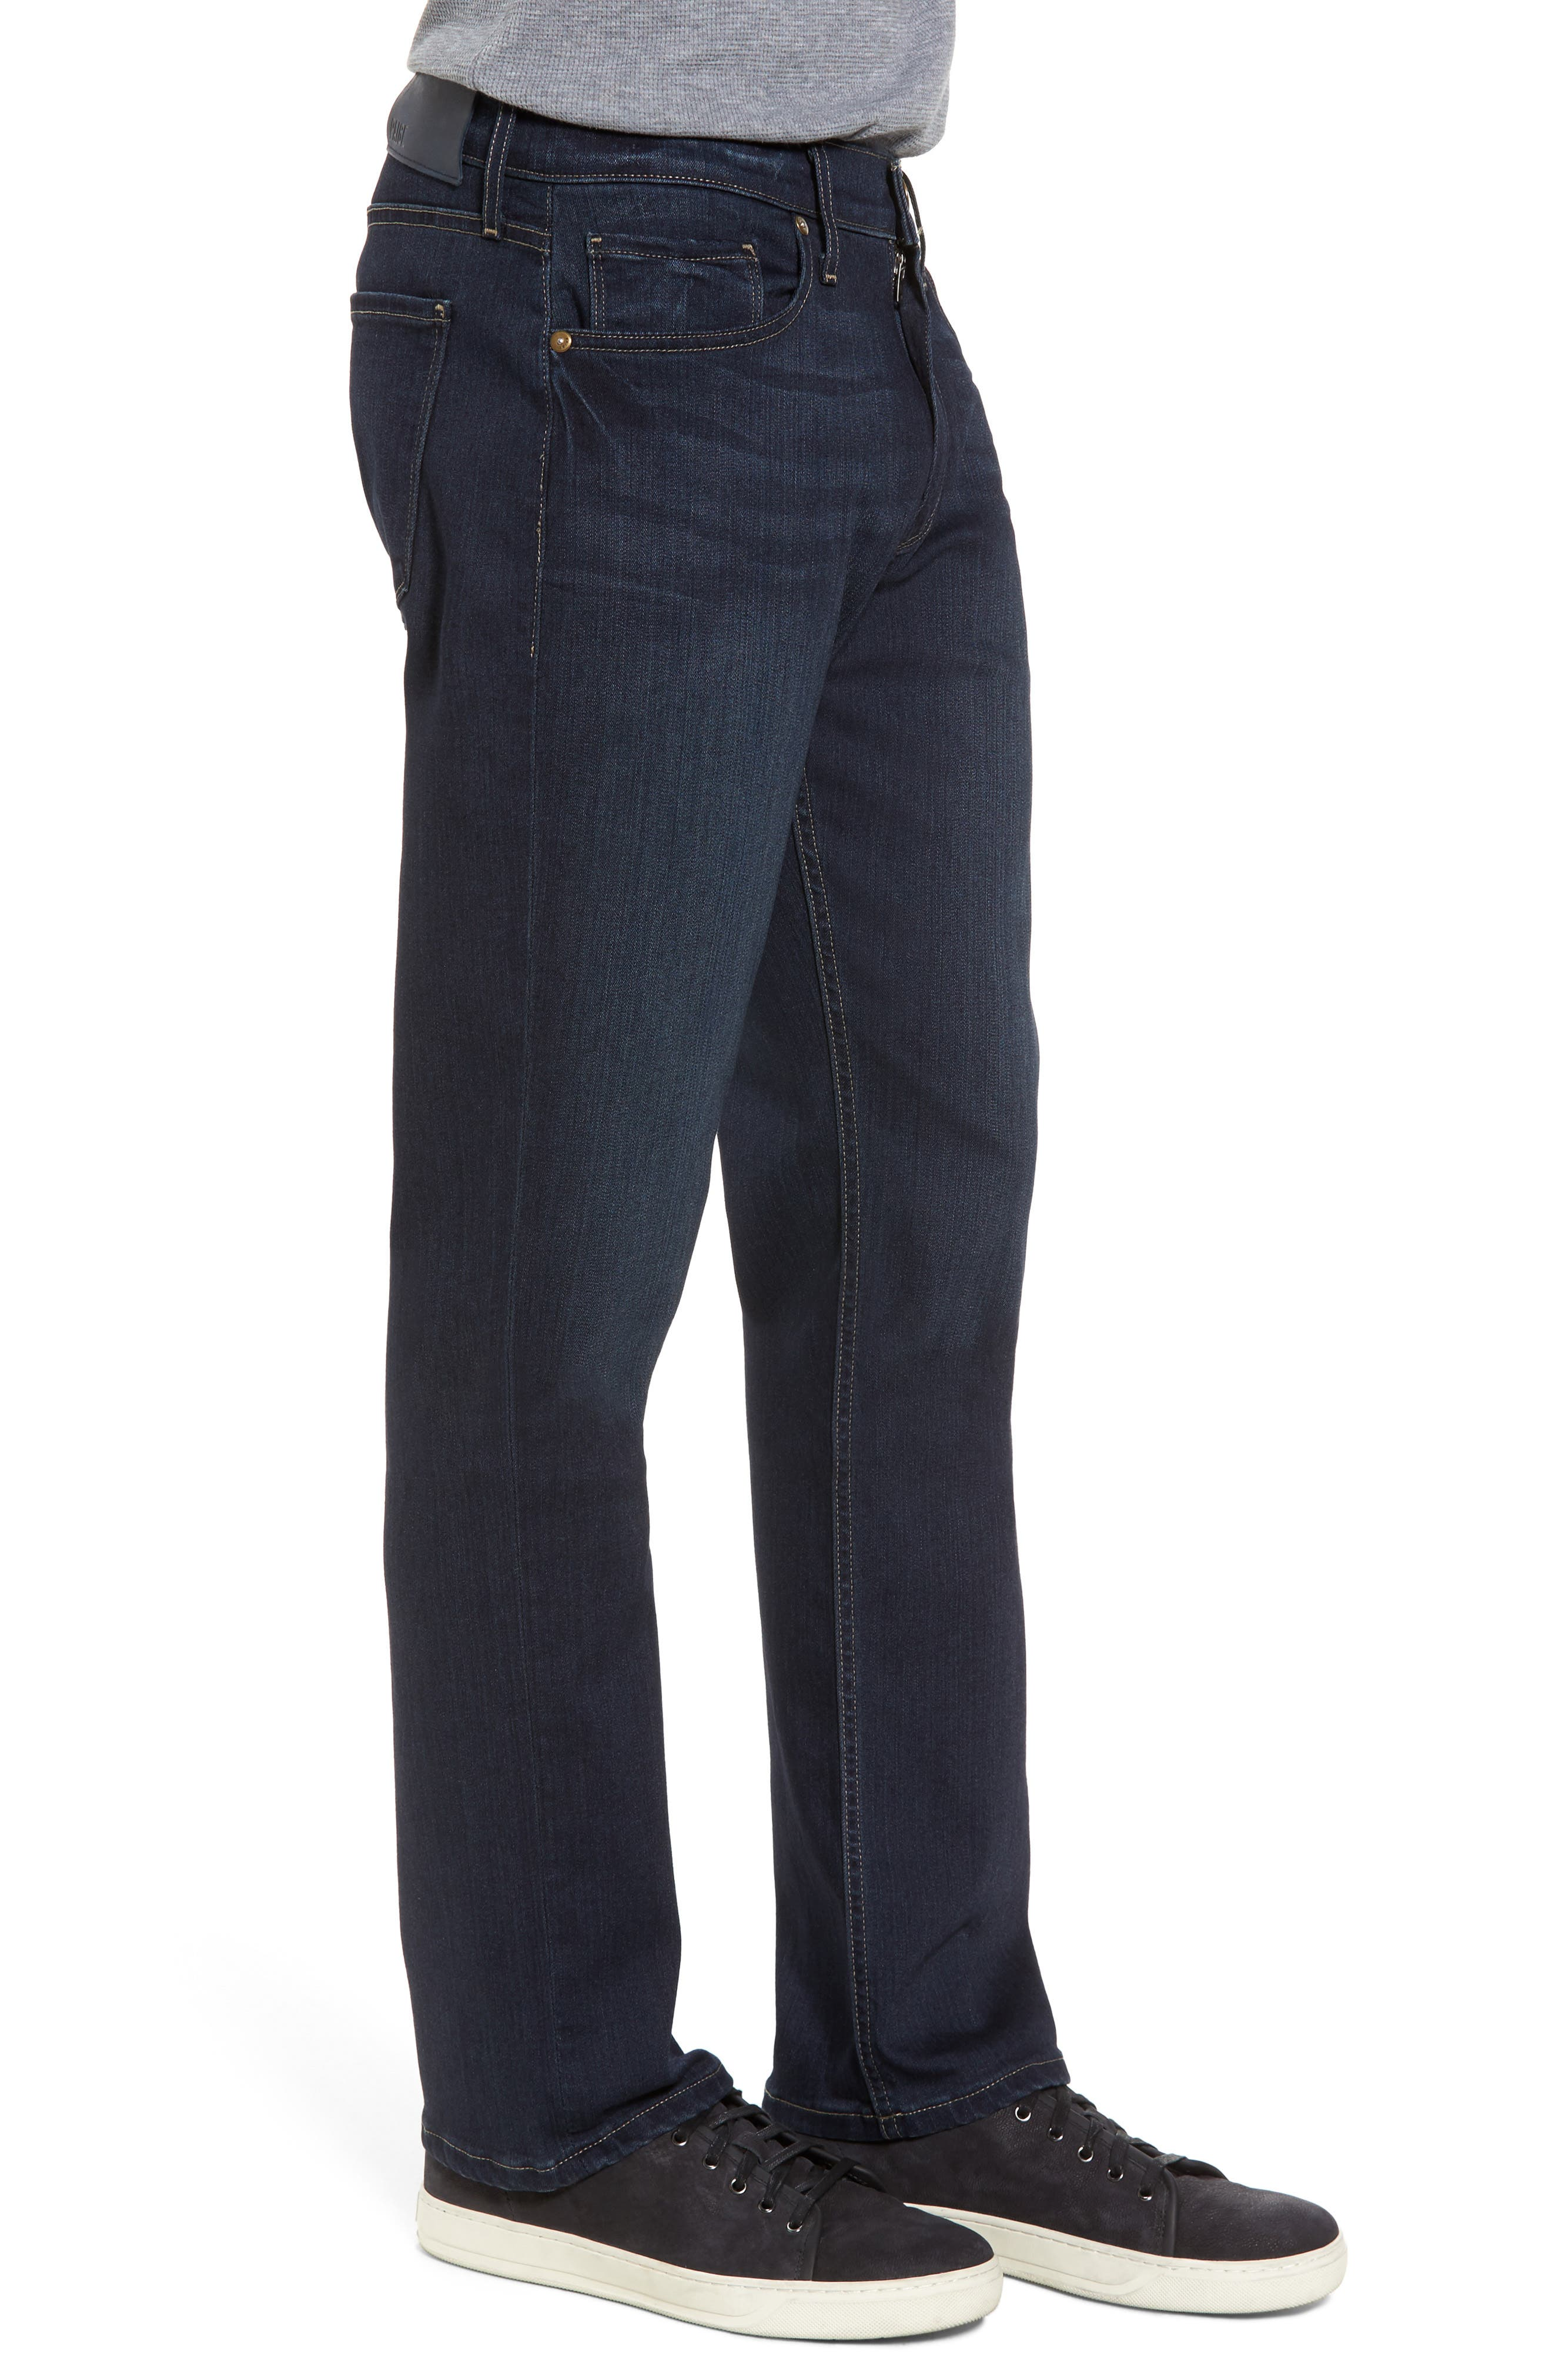 Transcend - Normandie Straight Fit Jeans,                             Alternate thumbnail 3, color,